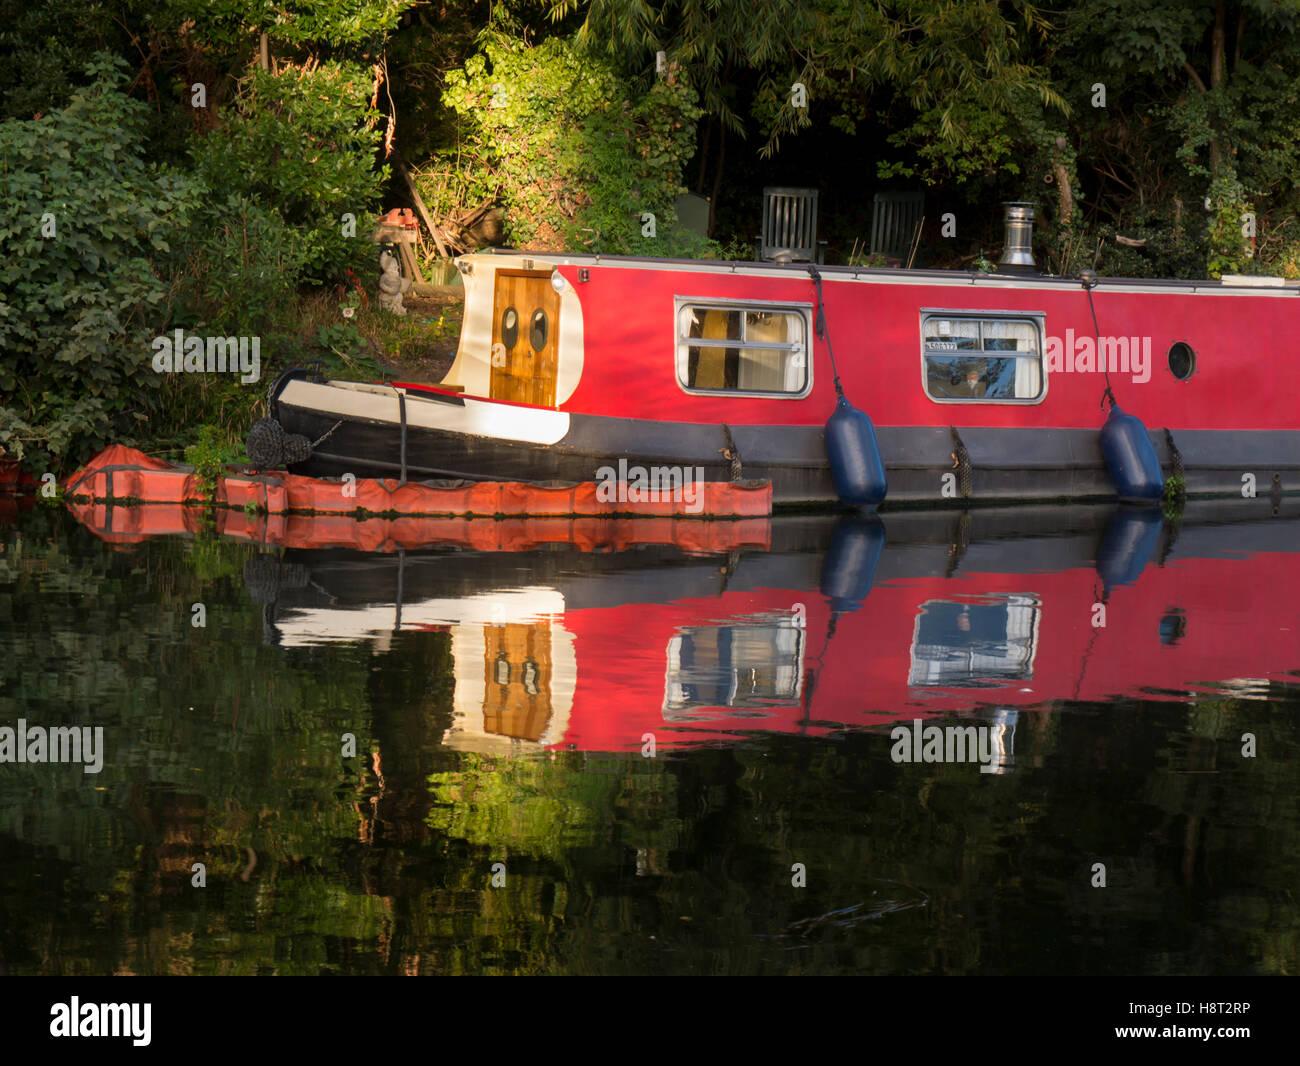 Europe, UK, England, London, Clapton, River Lea - Stock Image